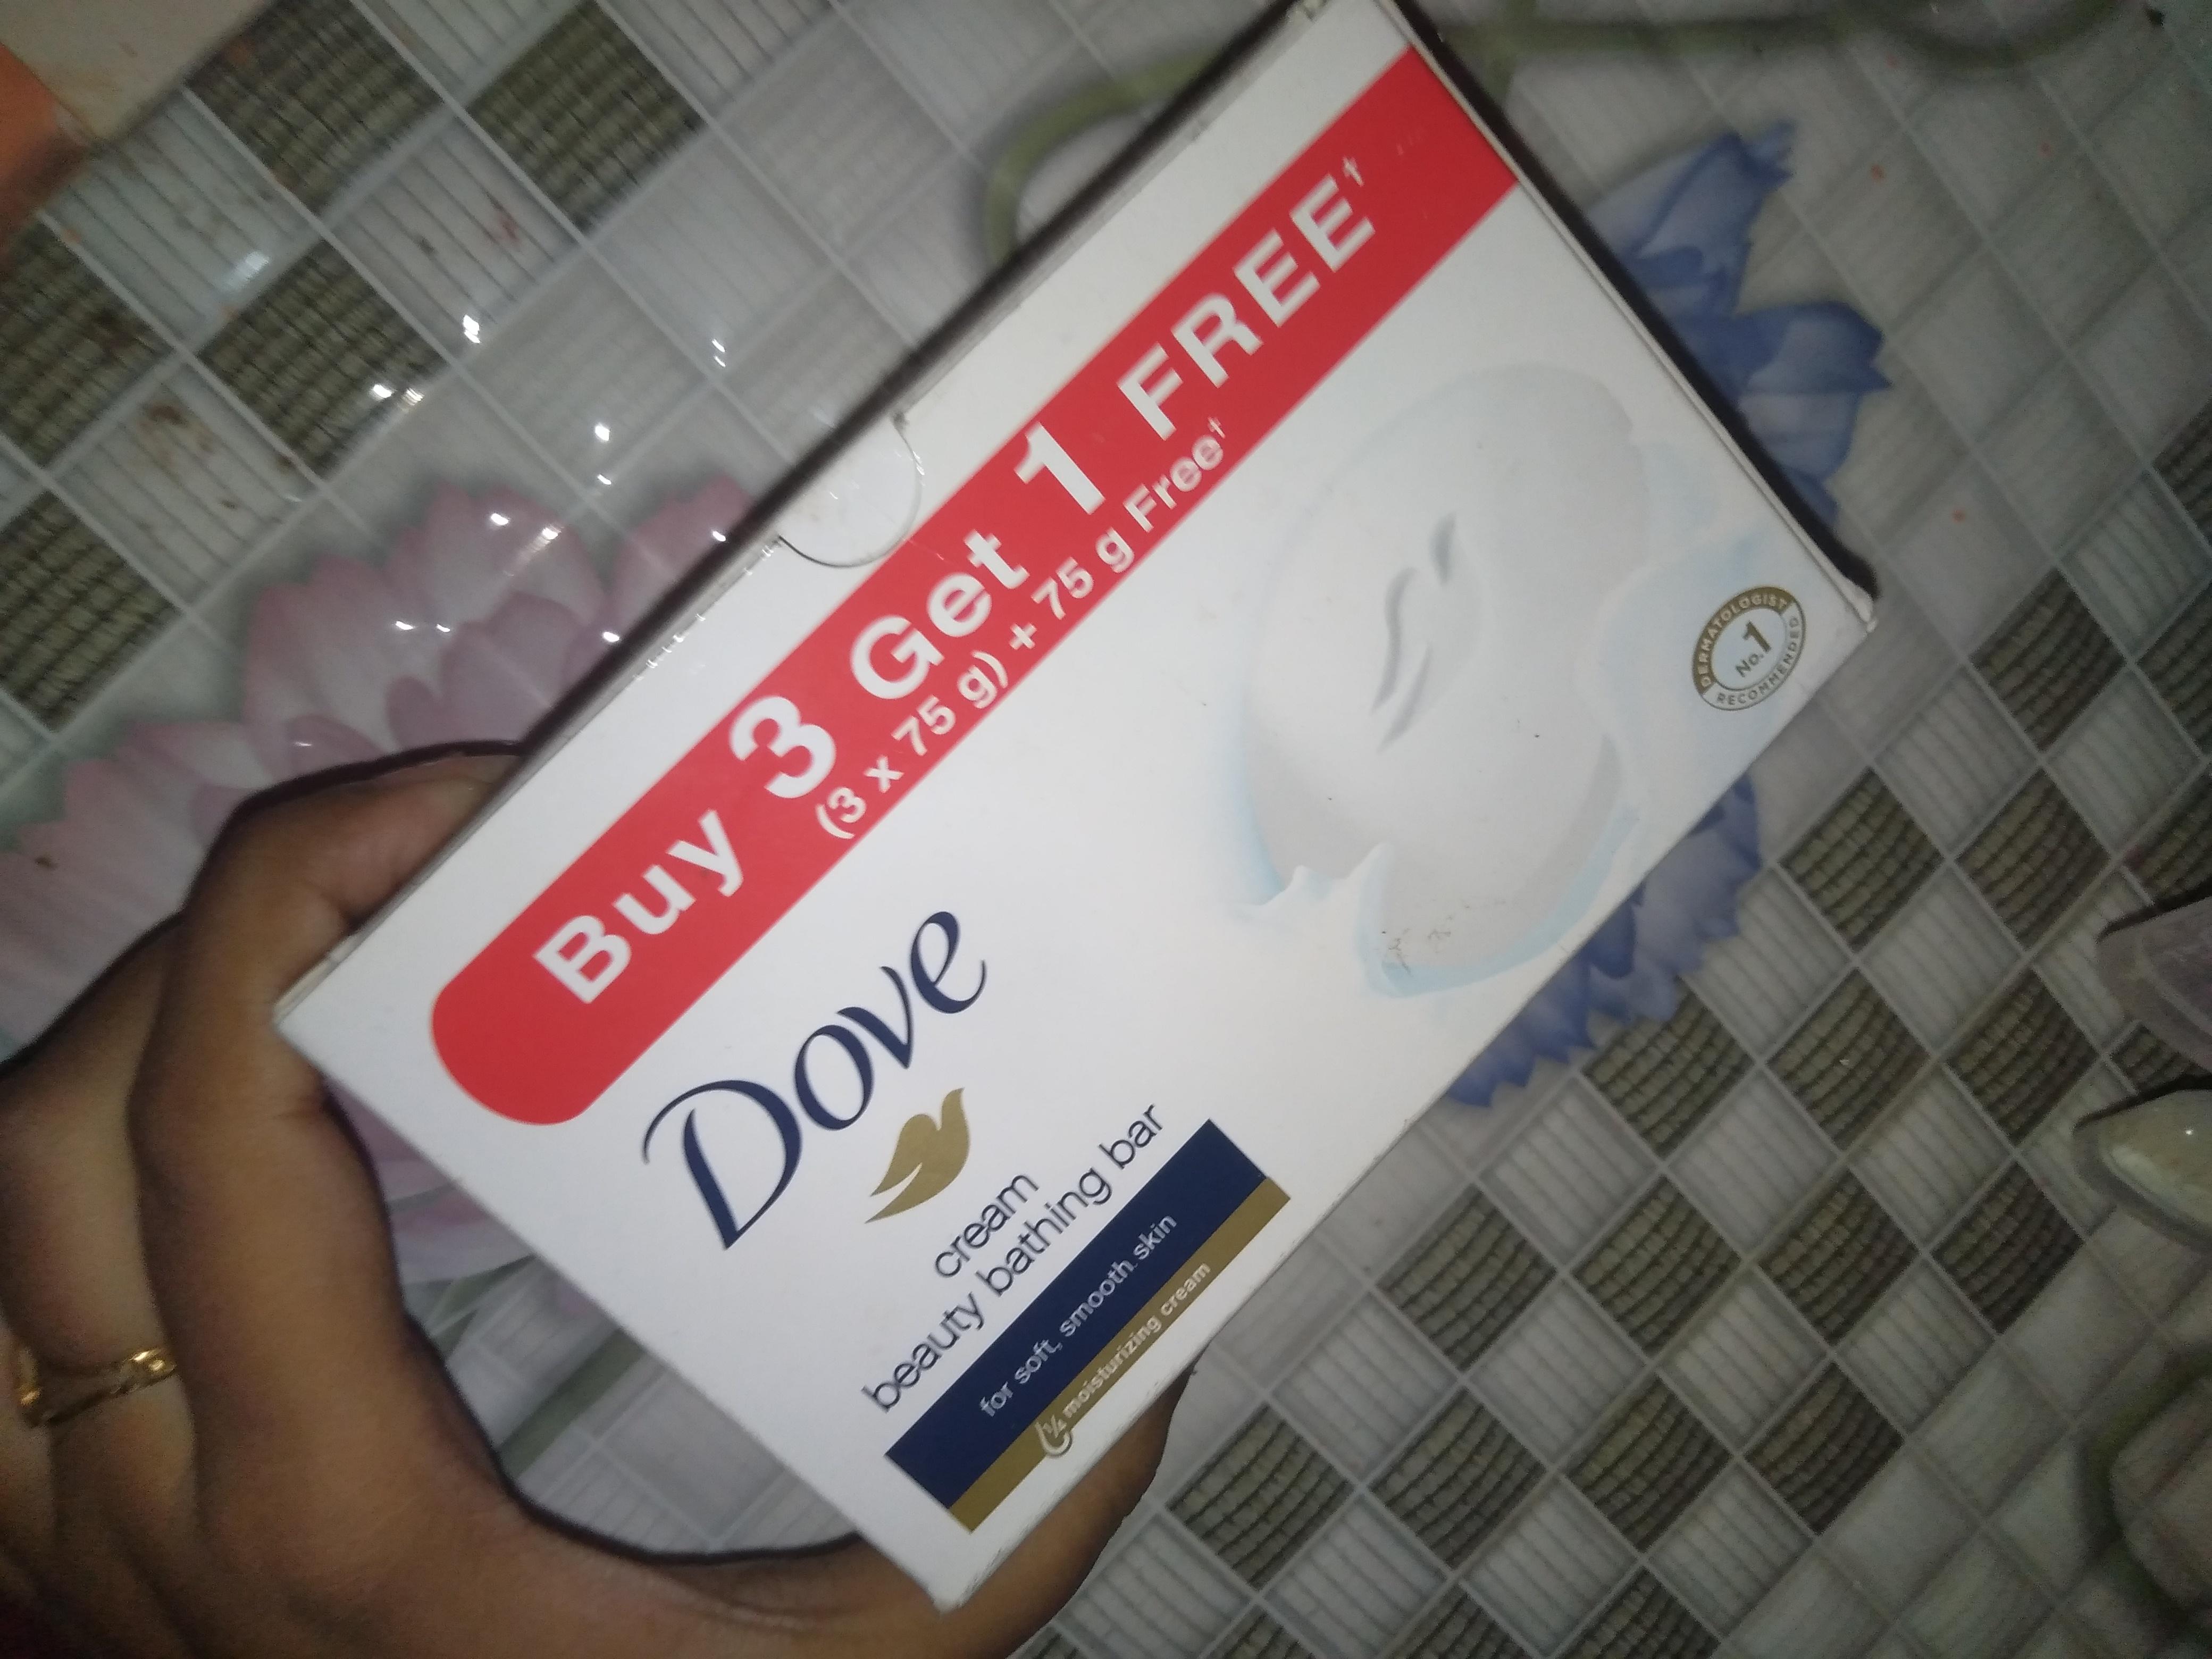 Dove Cream Beauty Bathing Bar-Creamy & Moisturizing-By indranireviews